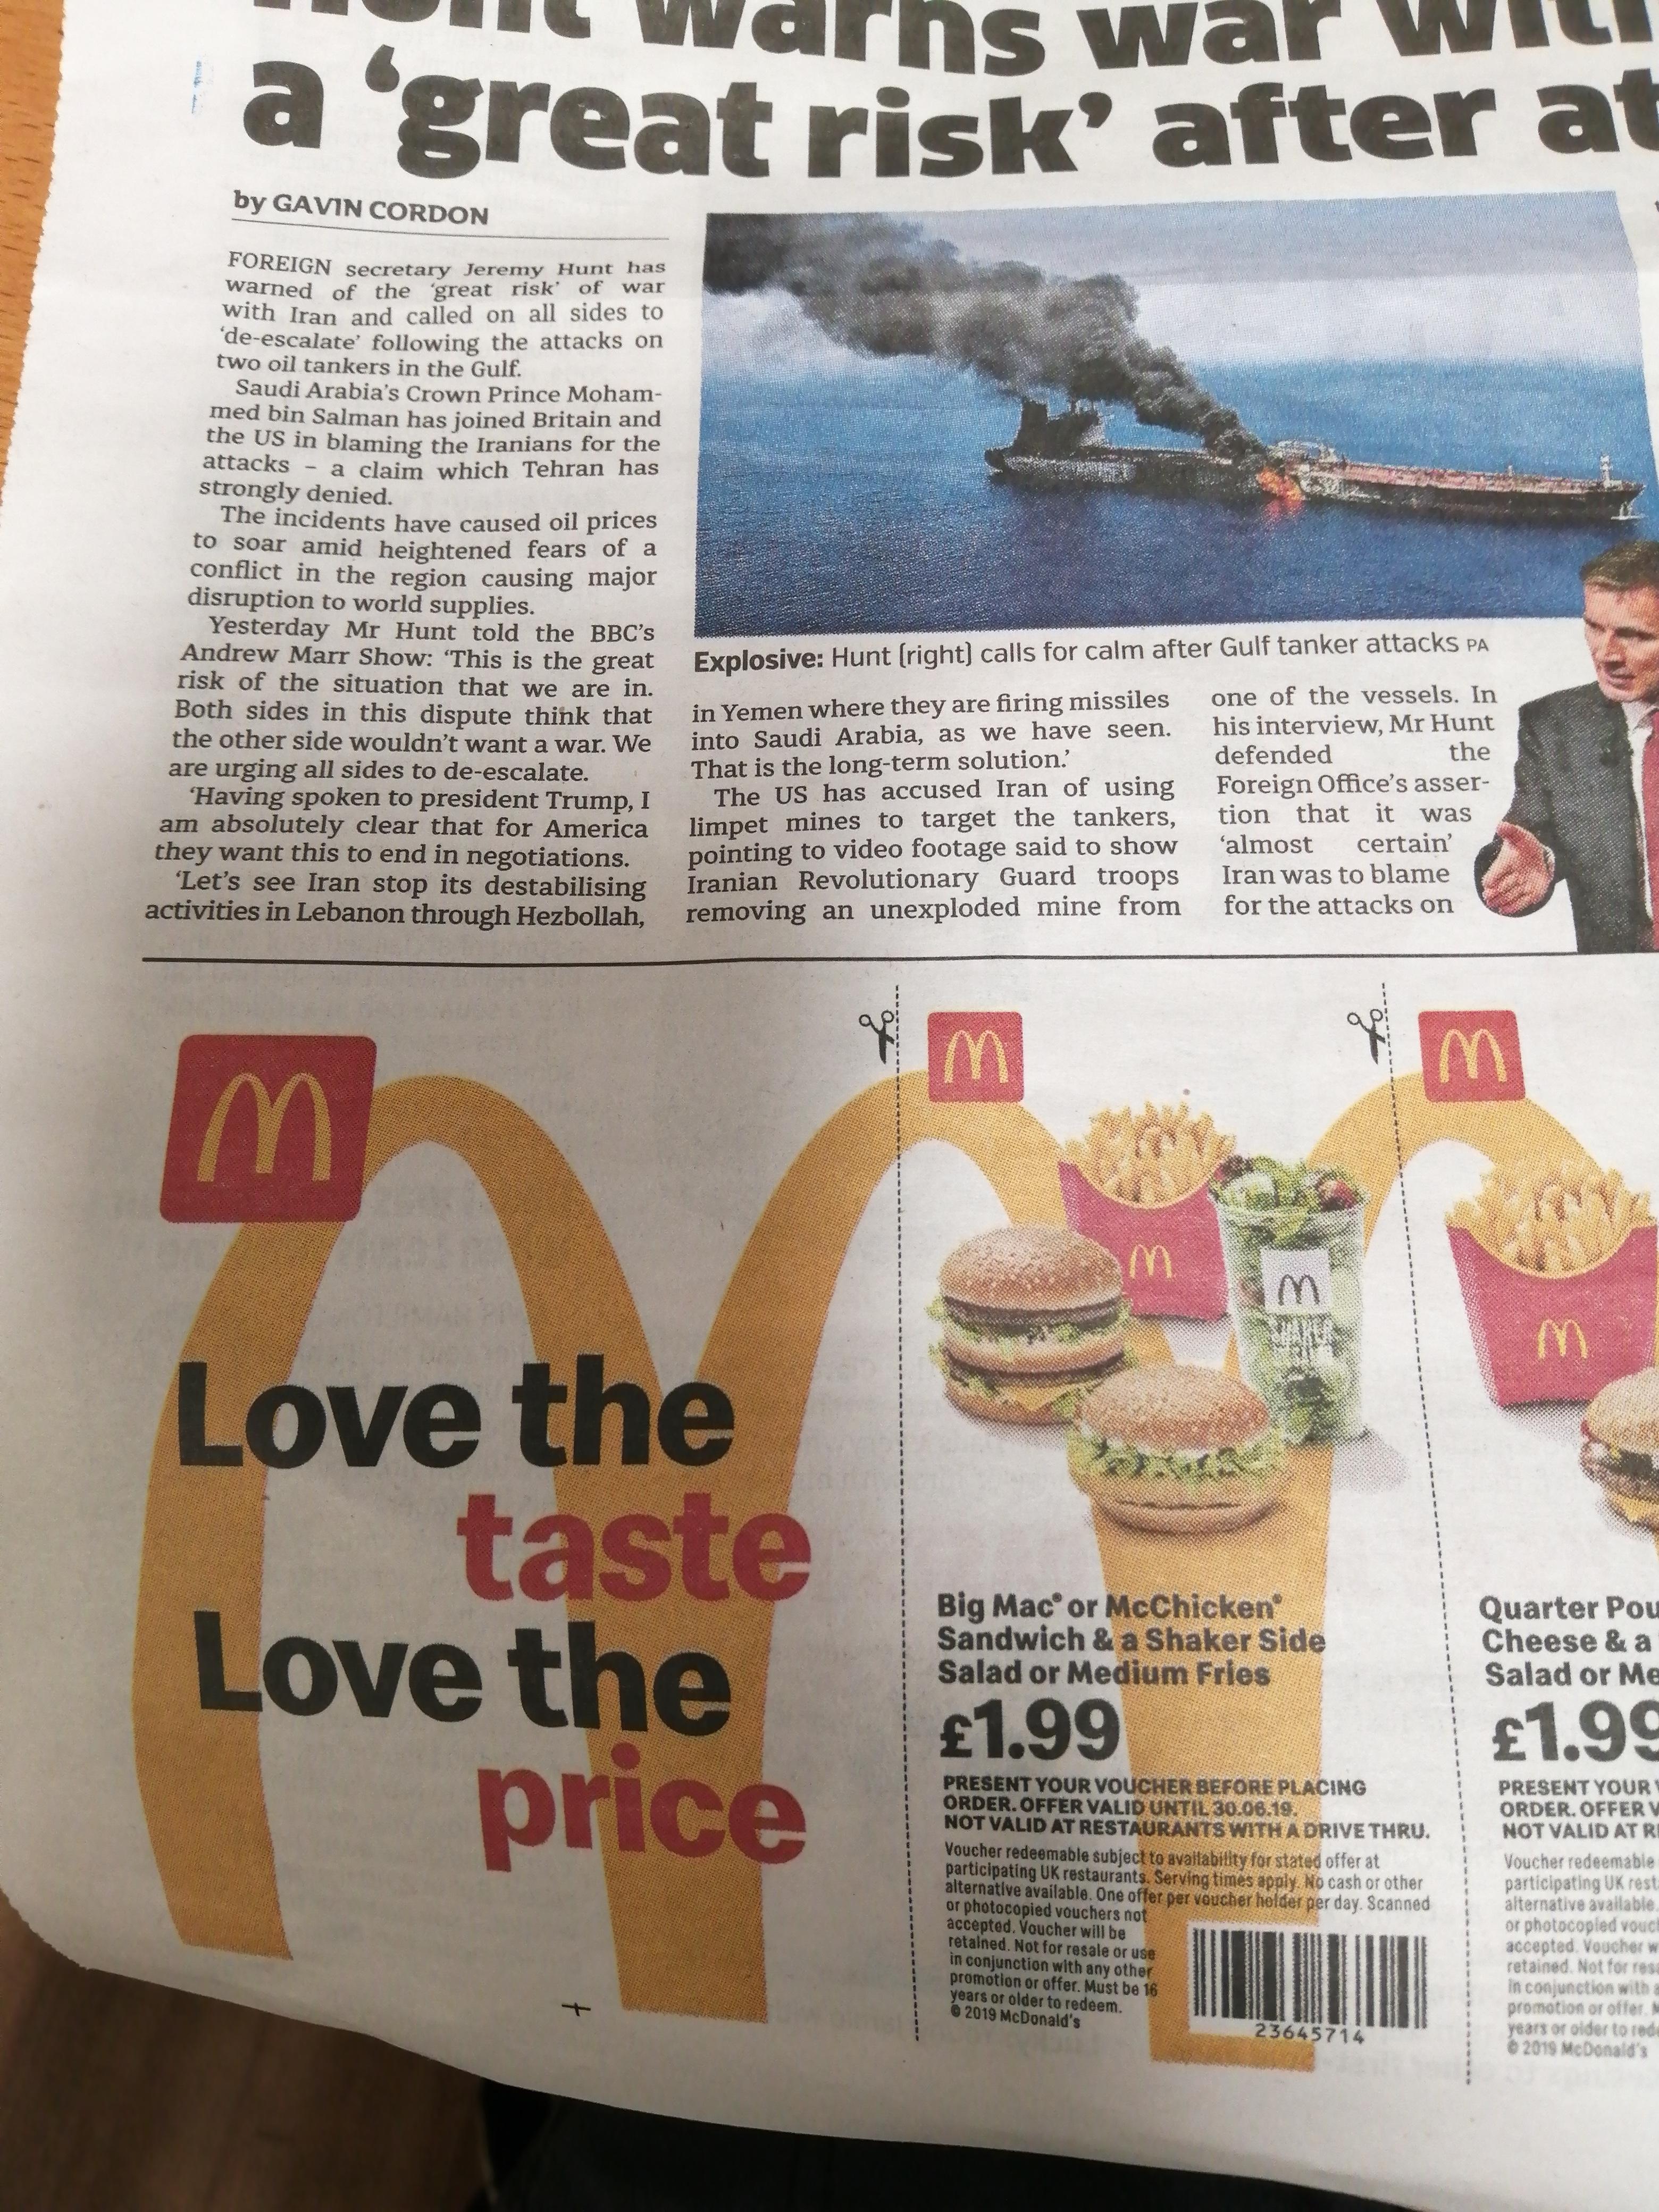 McDonald's vouchers - Today's London Metro